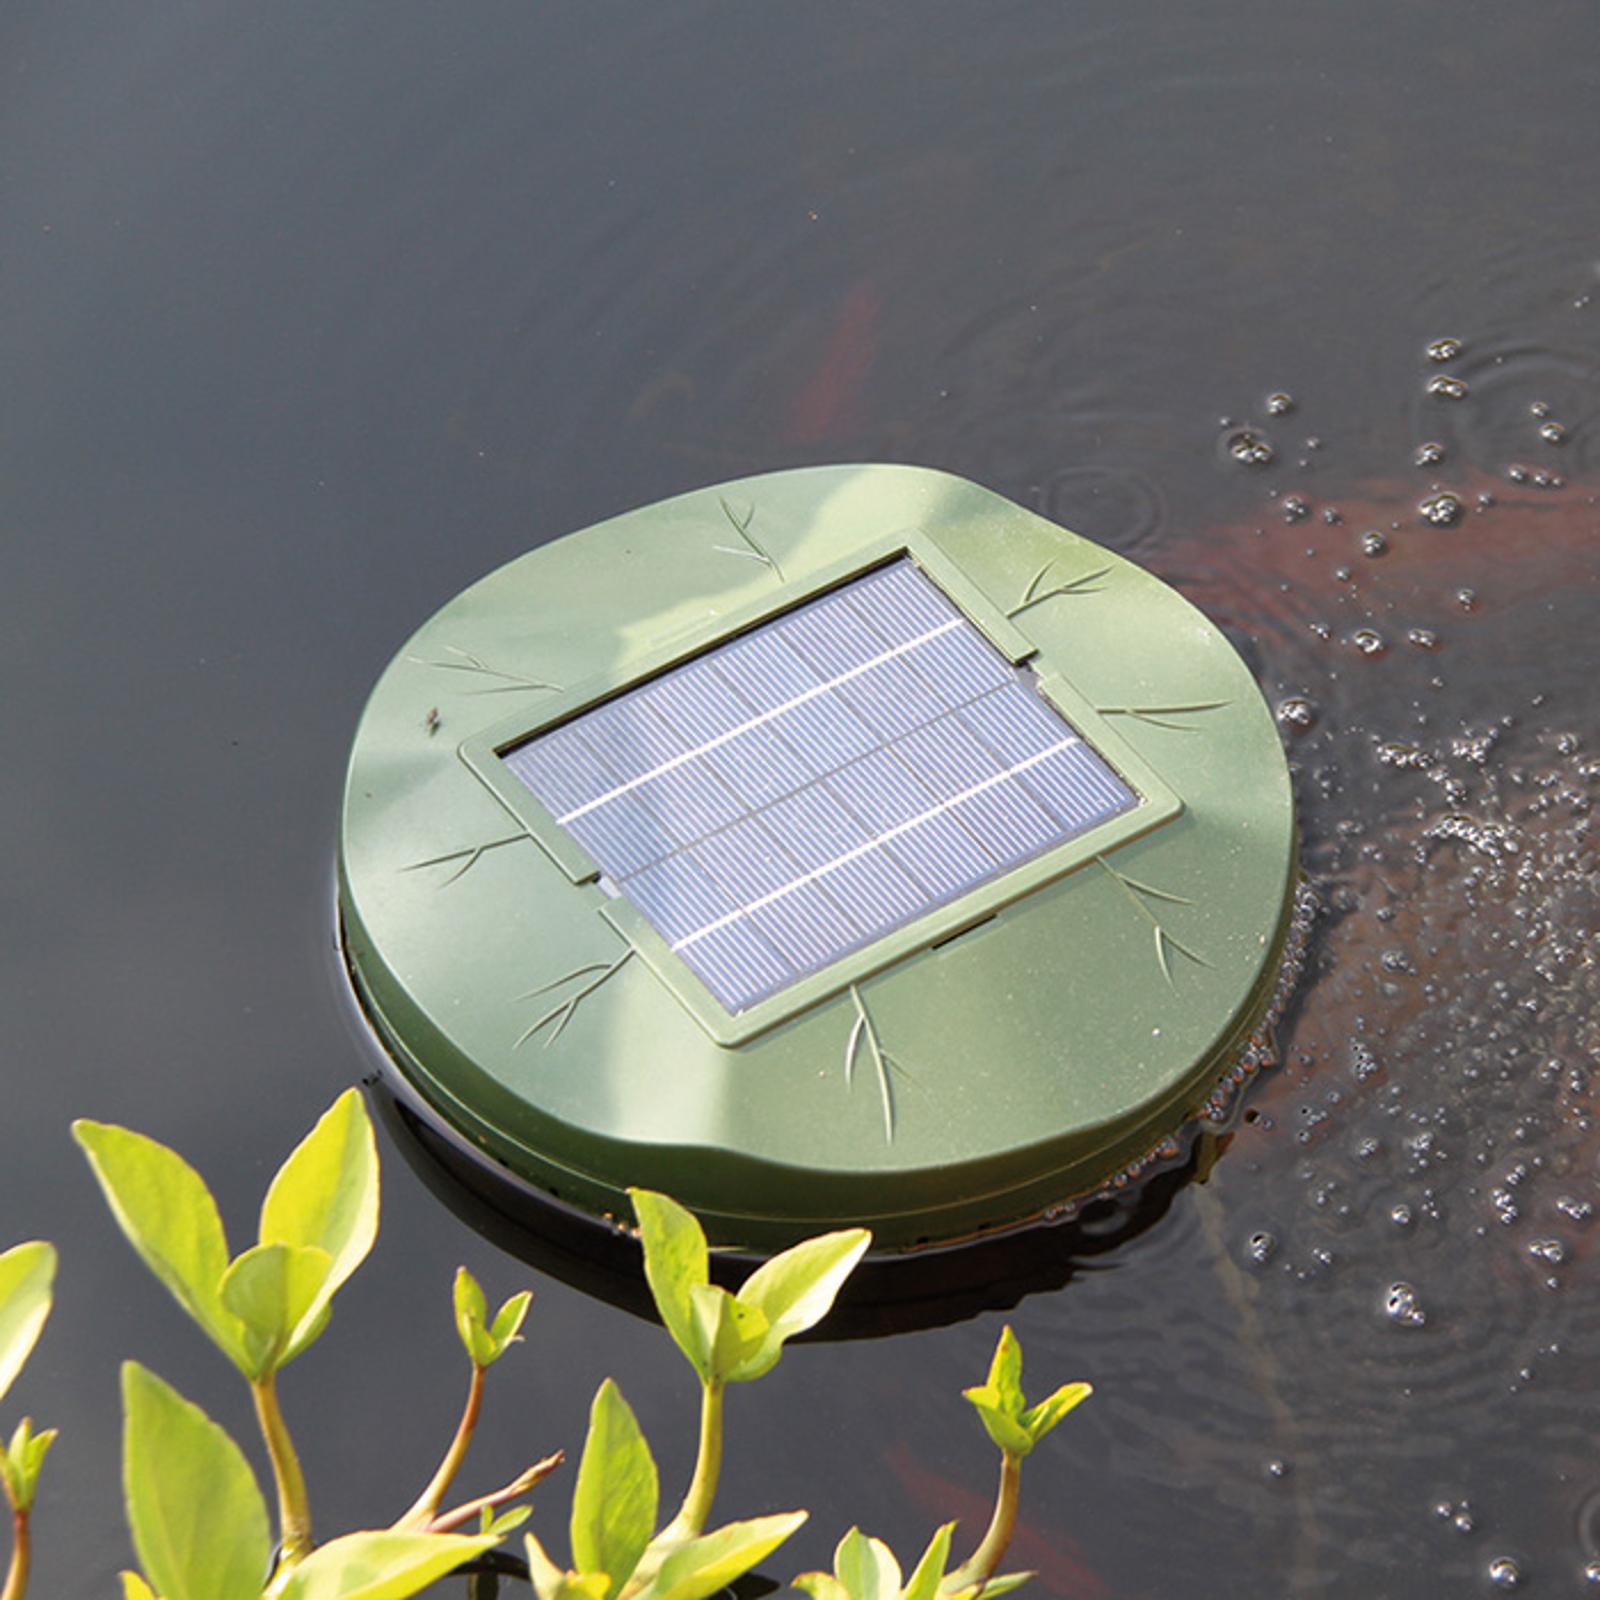 Aeratore idrico Floating Air a energia solare